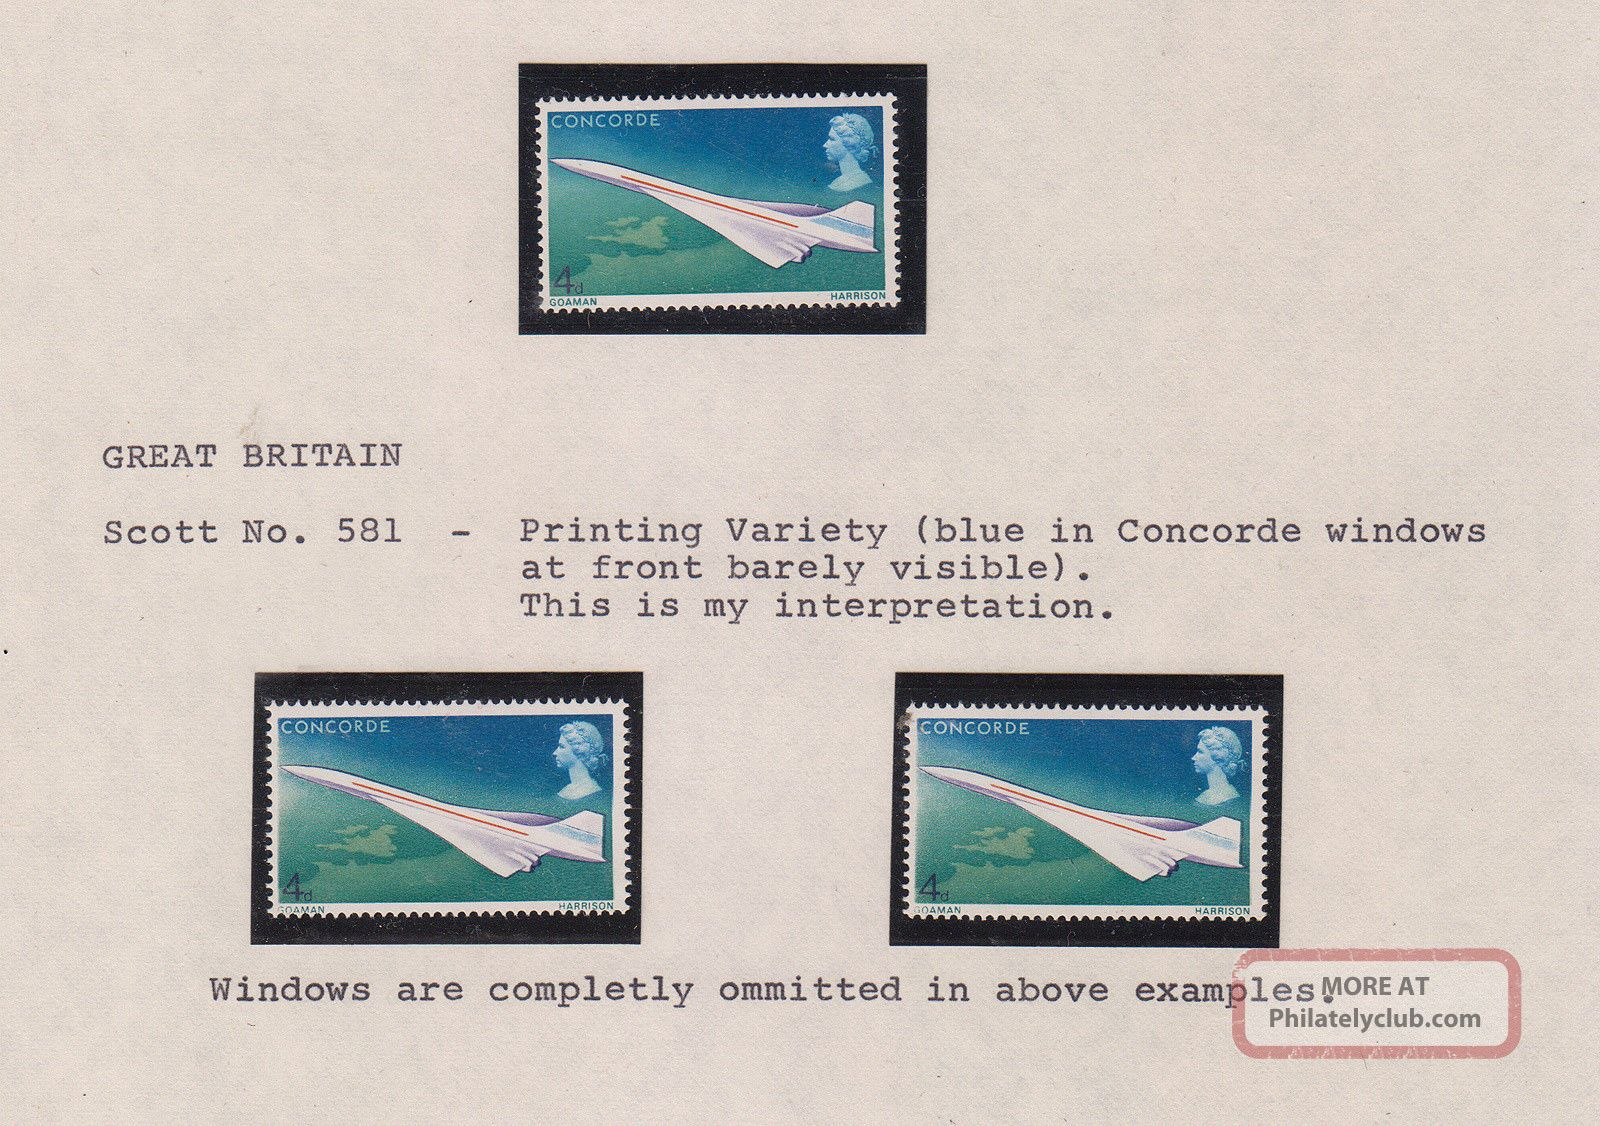 3 1967 Goaman Harrison 1st Flight Concorde Stamp Variations - 4d - Cockpit Windows Transportation photo